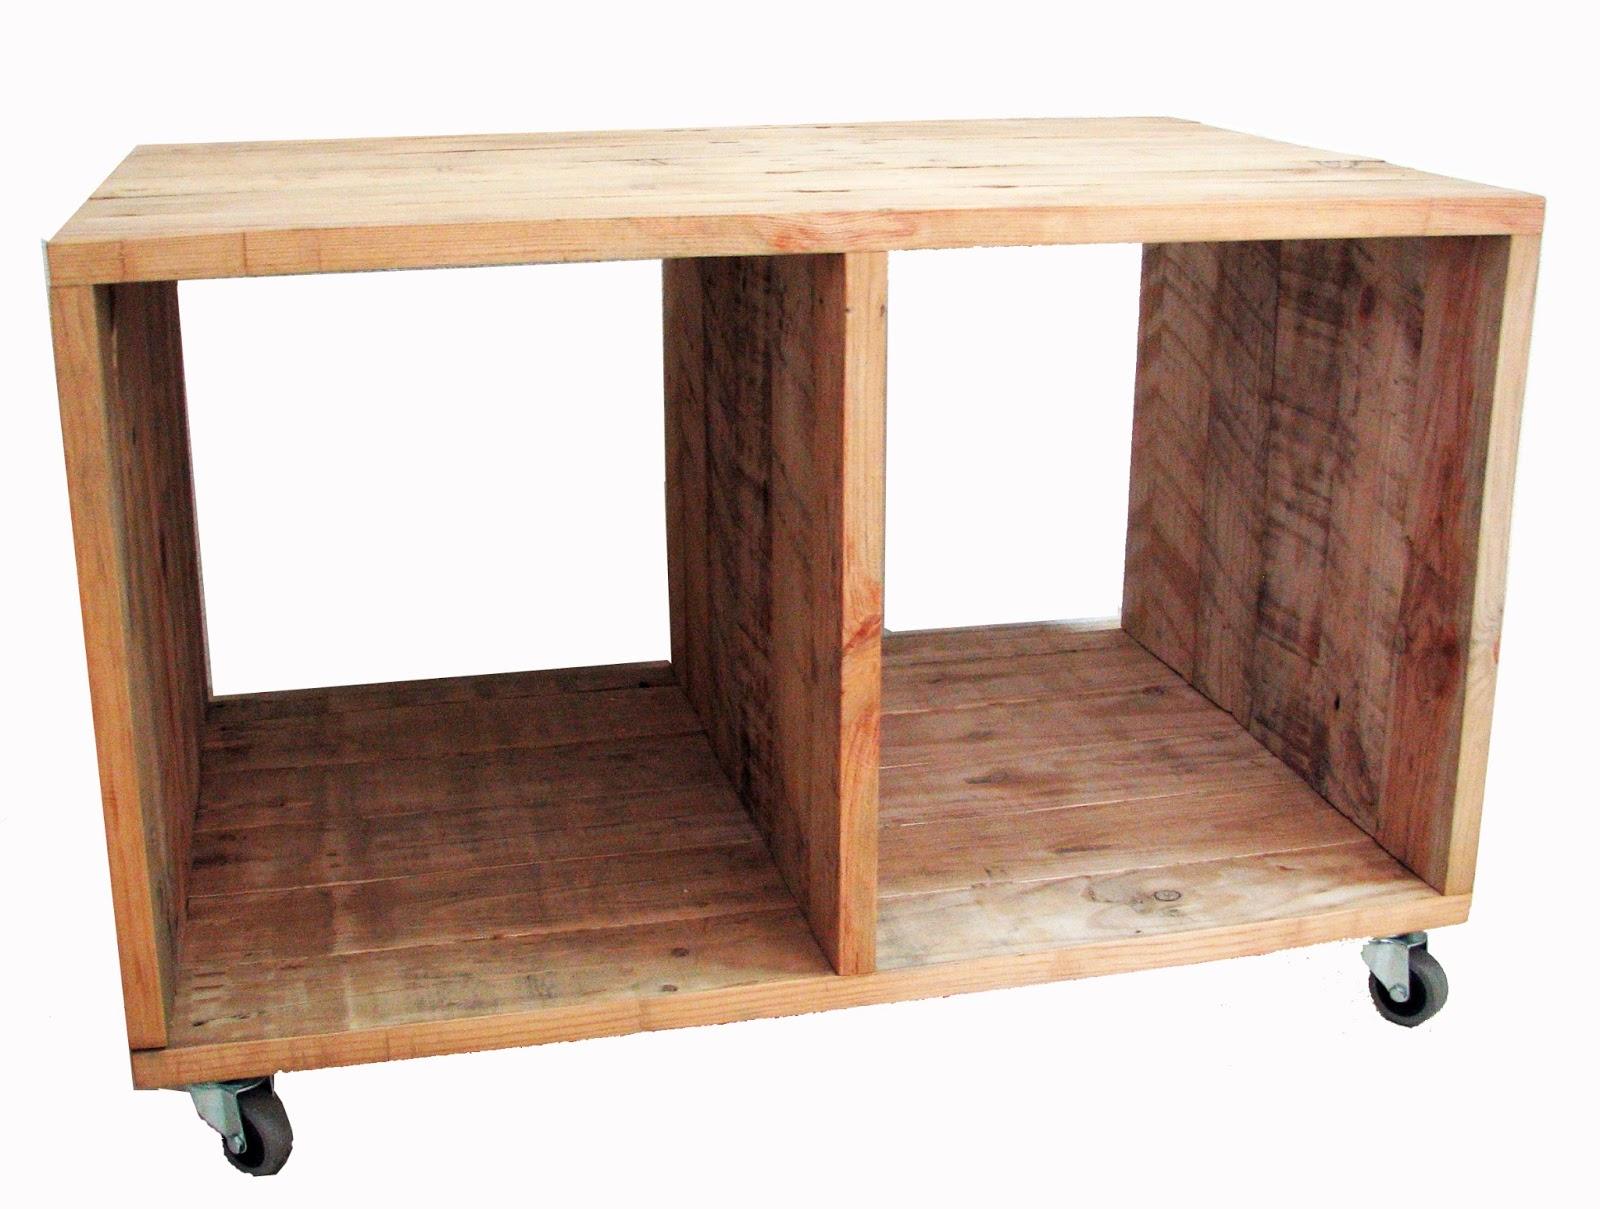 Urban wood mesa auxiliar con ruedas for Mesa auxiliar cocina con ruedas